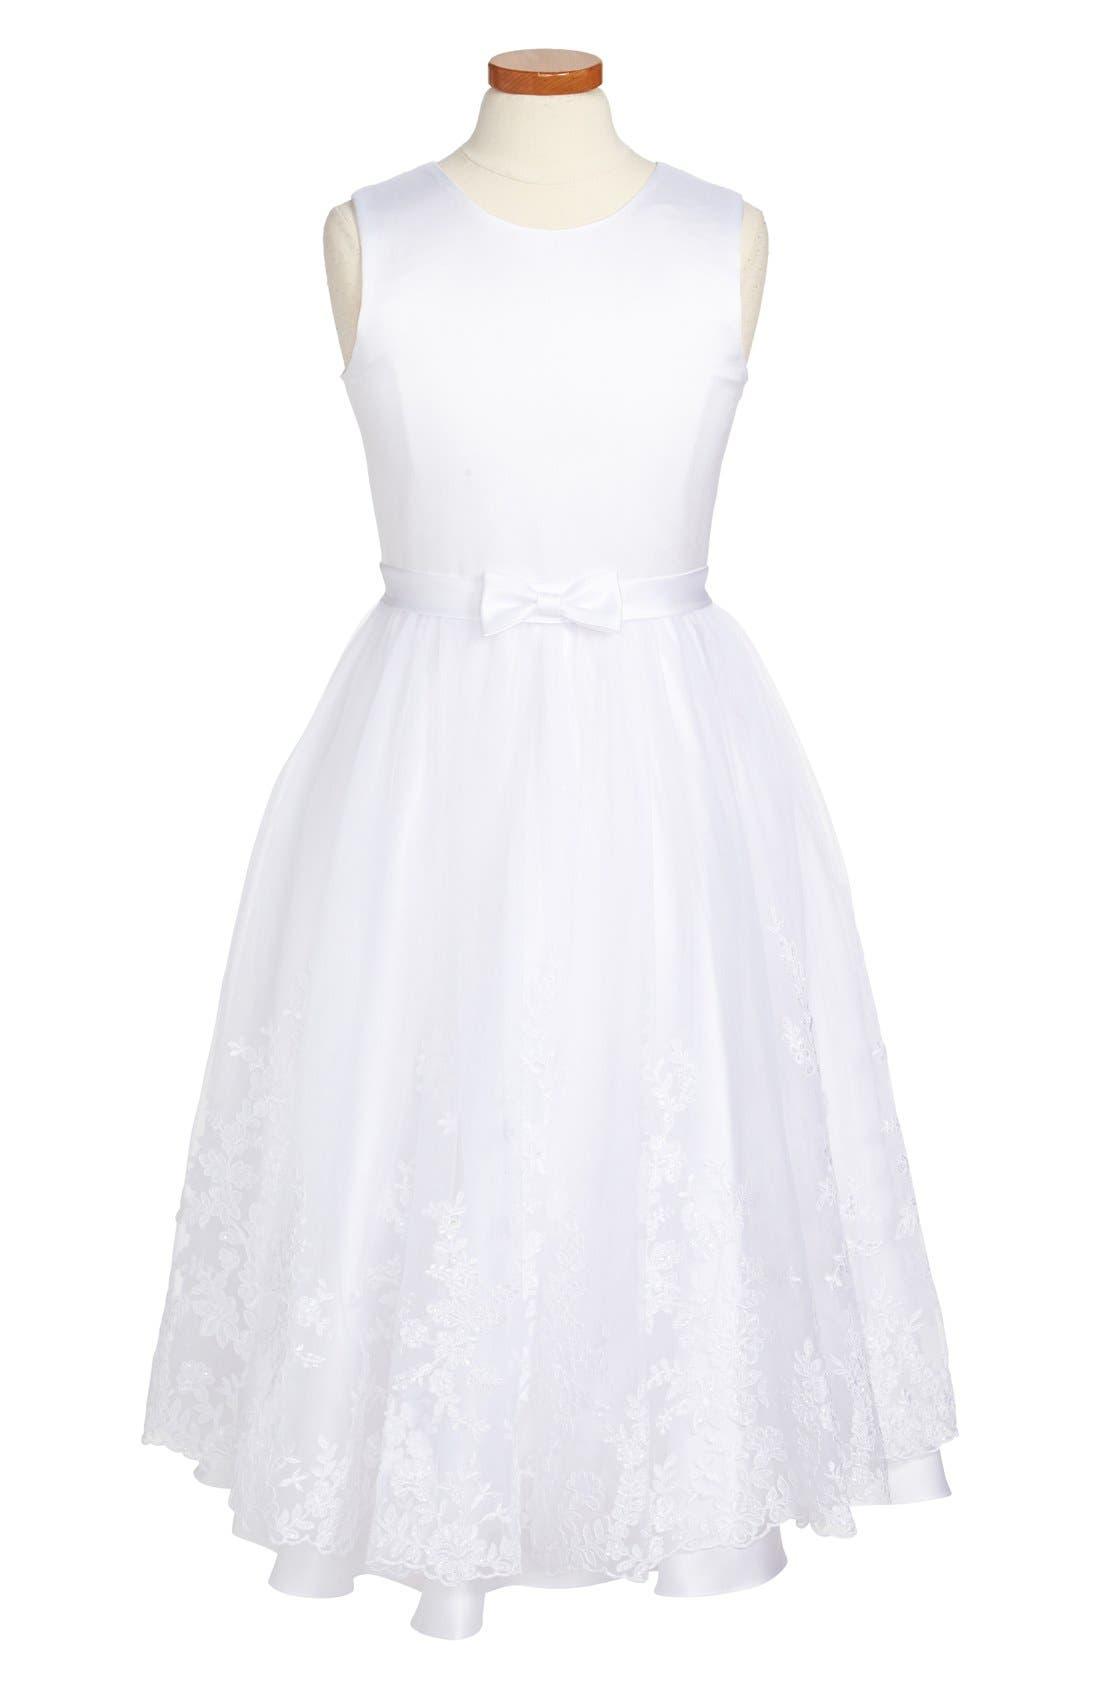 Alternate Image 1 Selected - Joan Calabrese for Mon Cheri First Communion Dress (Big Girls)